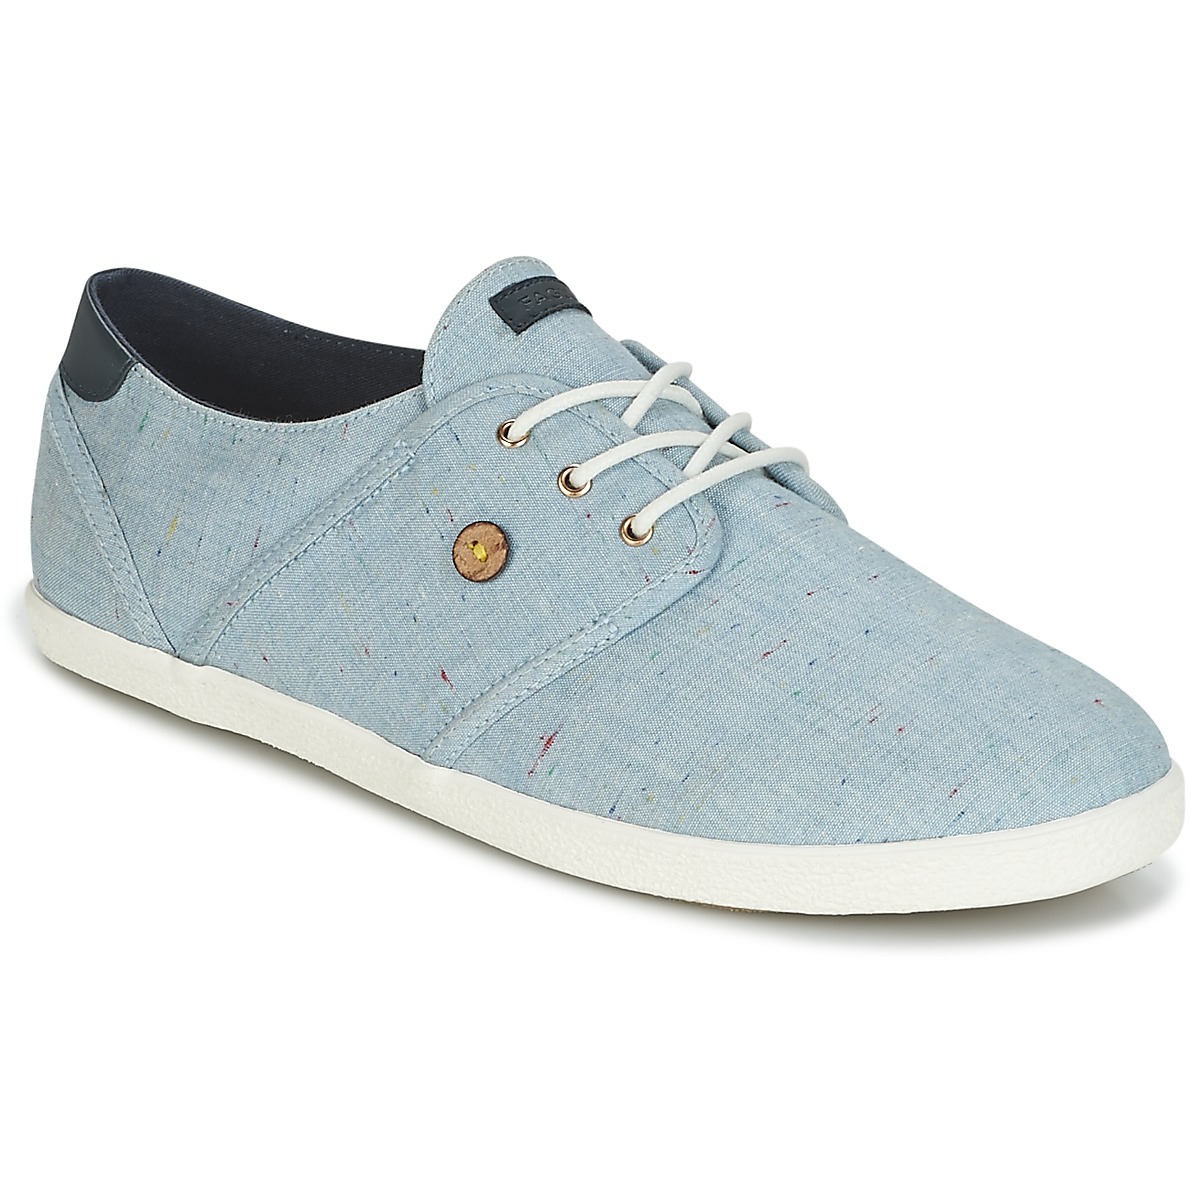 Faguo CYPRESS COTTON Blau - Kostenloser Versand bei Spartoode ! - Schuhe Sneaker Low  45,50 €